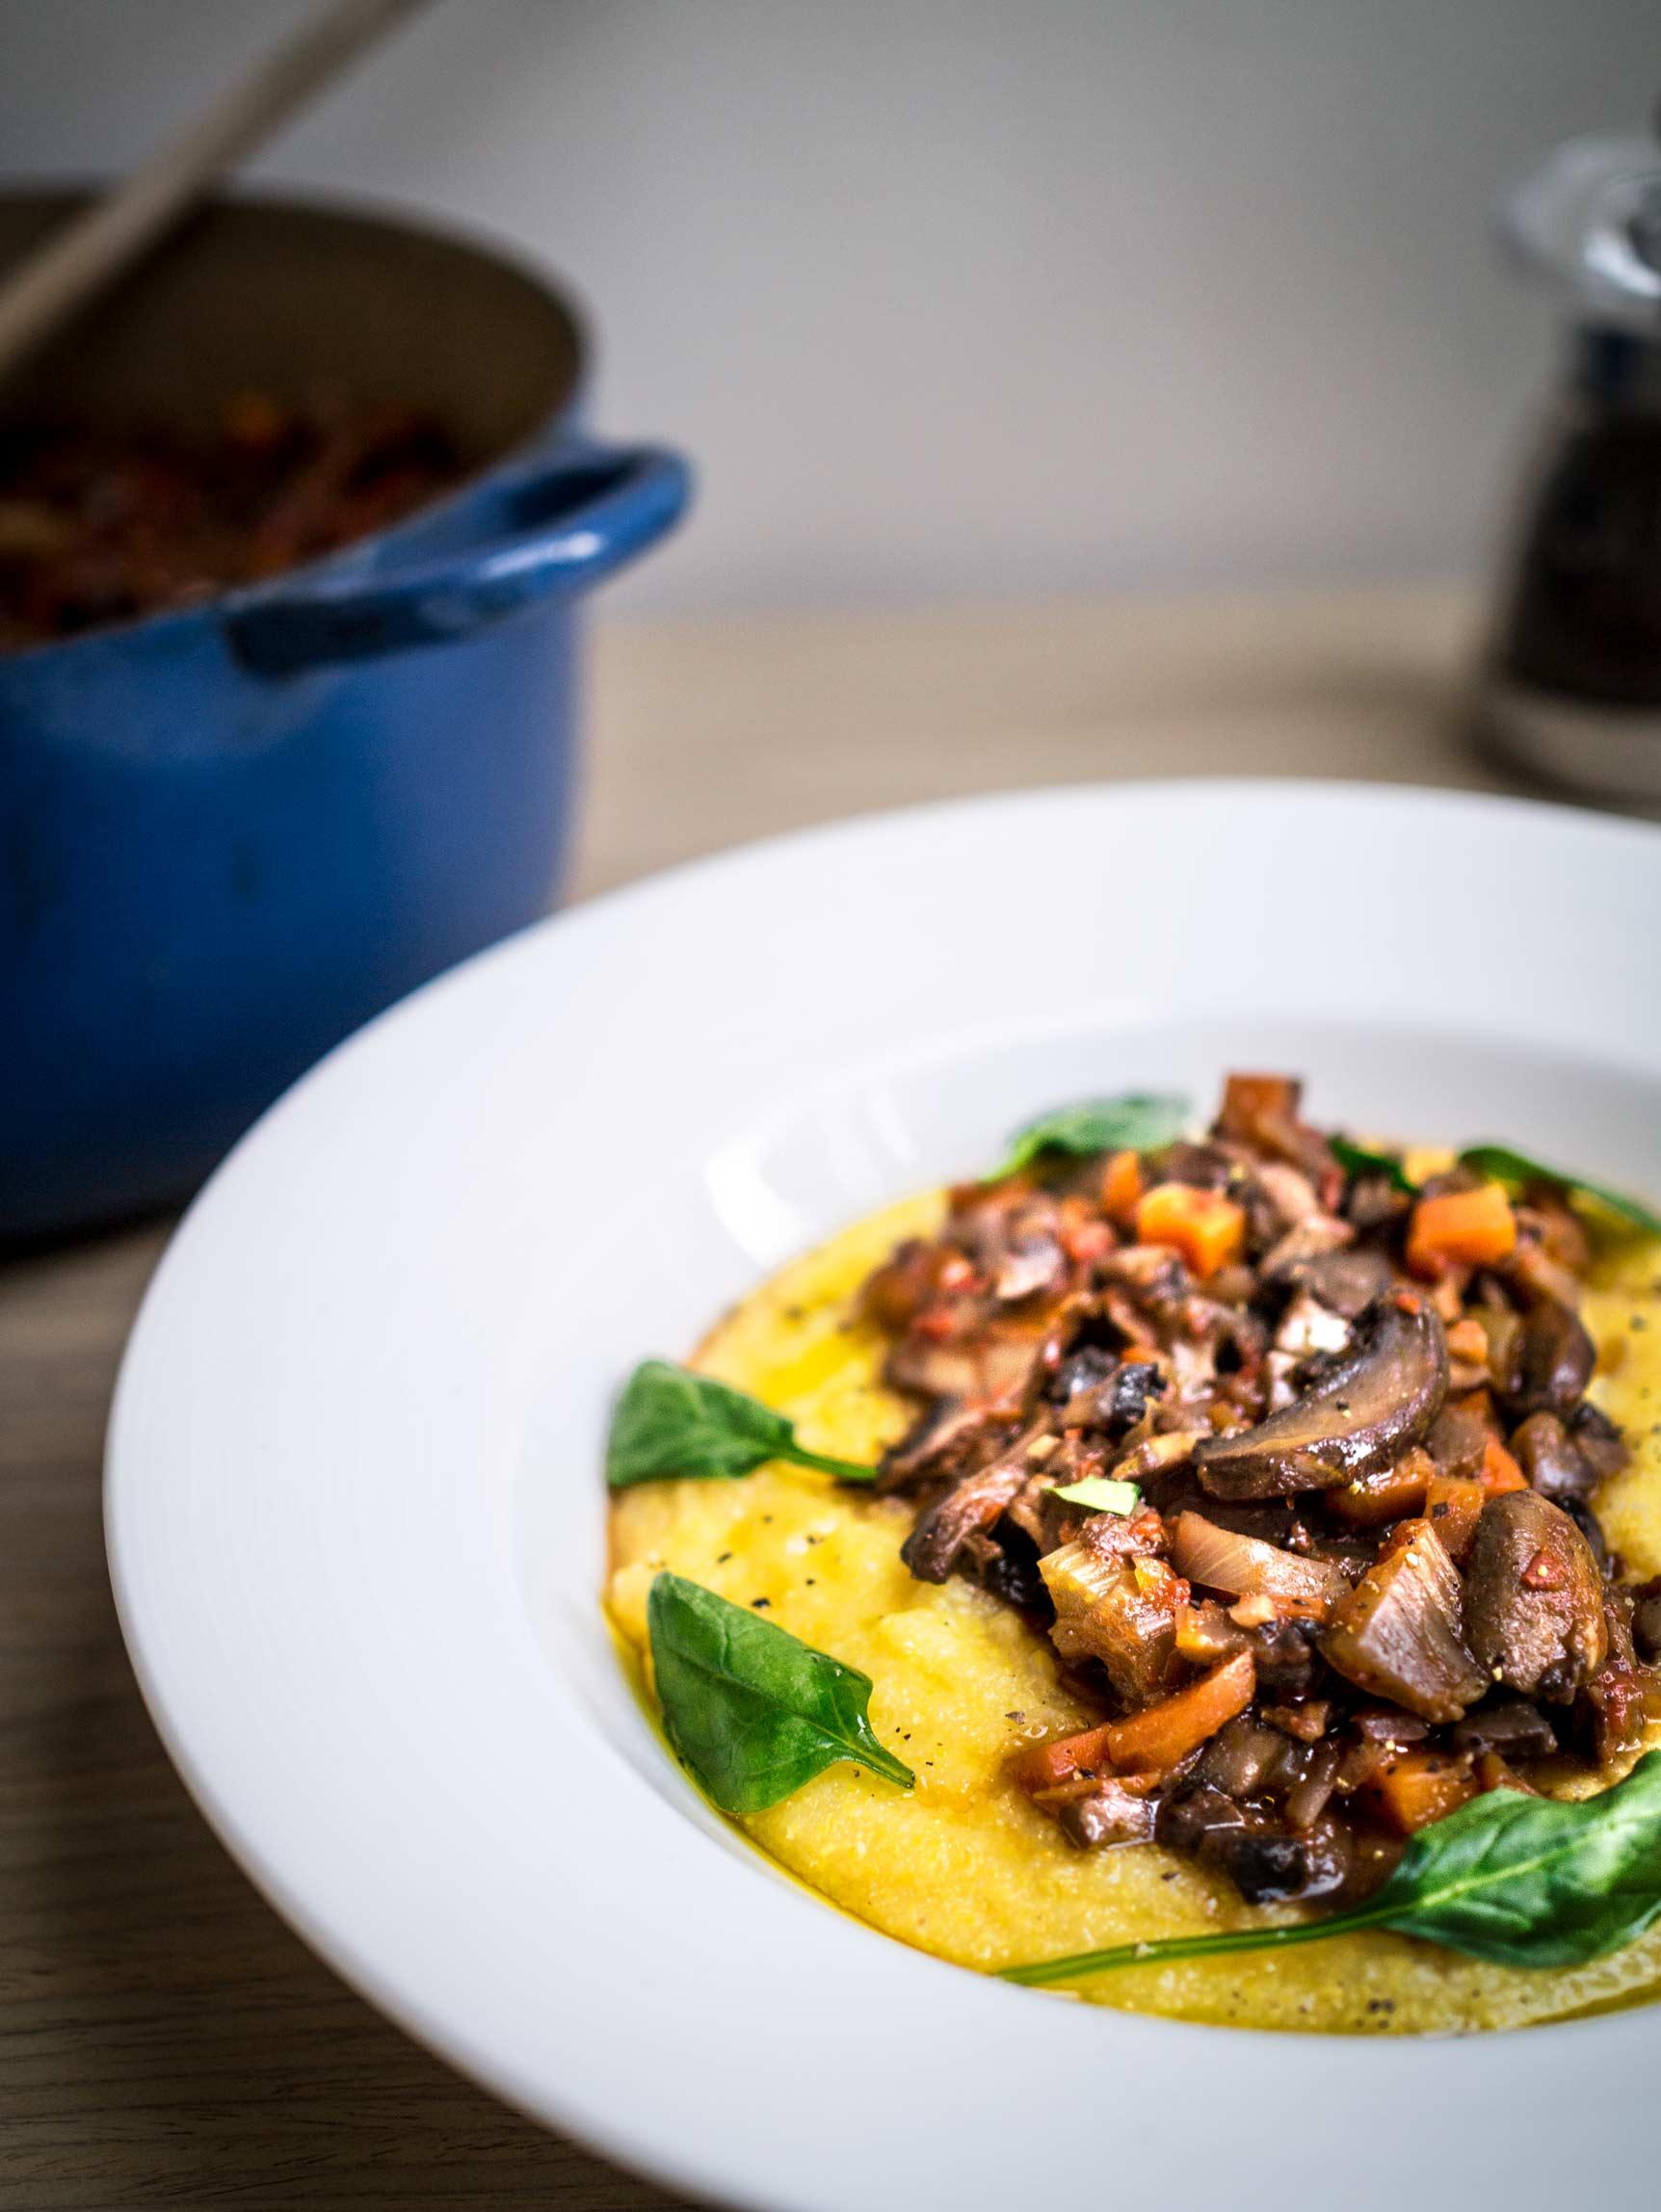 Mushroom Ragu with Creamy Polenta | Discover Delicious | www.discoverdelicious.org | Vegan Food Blog